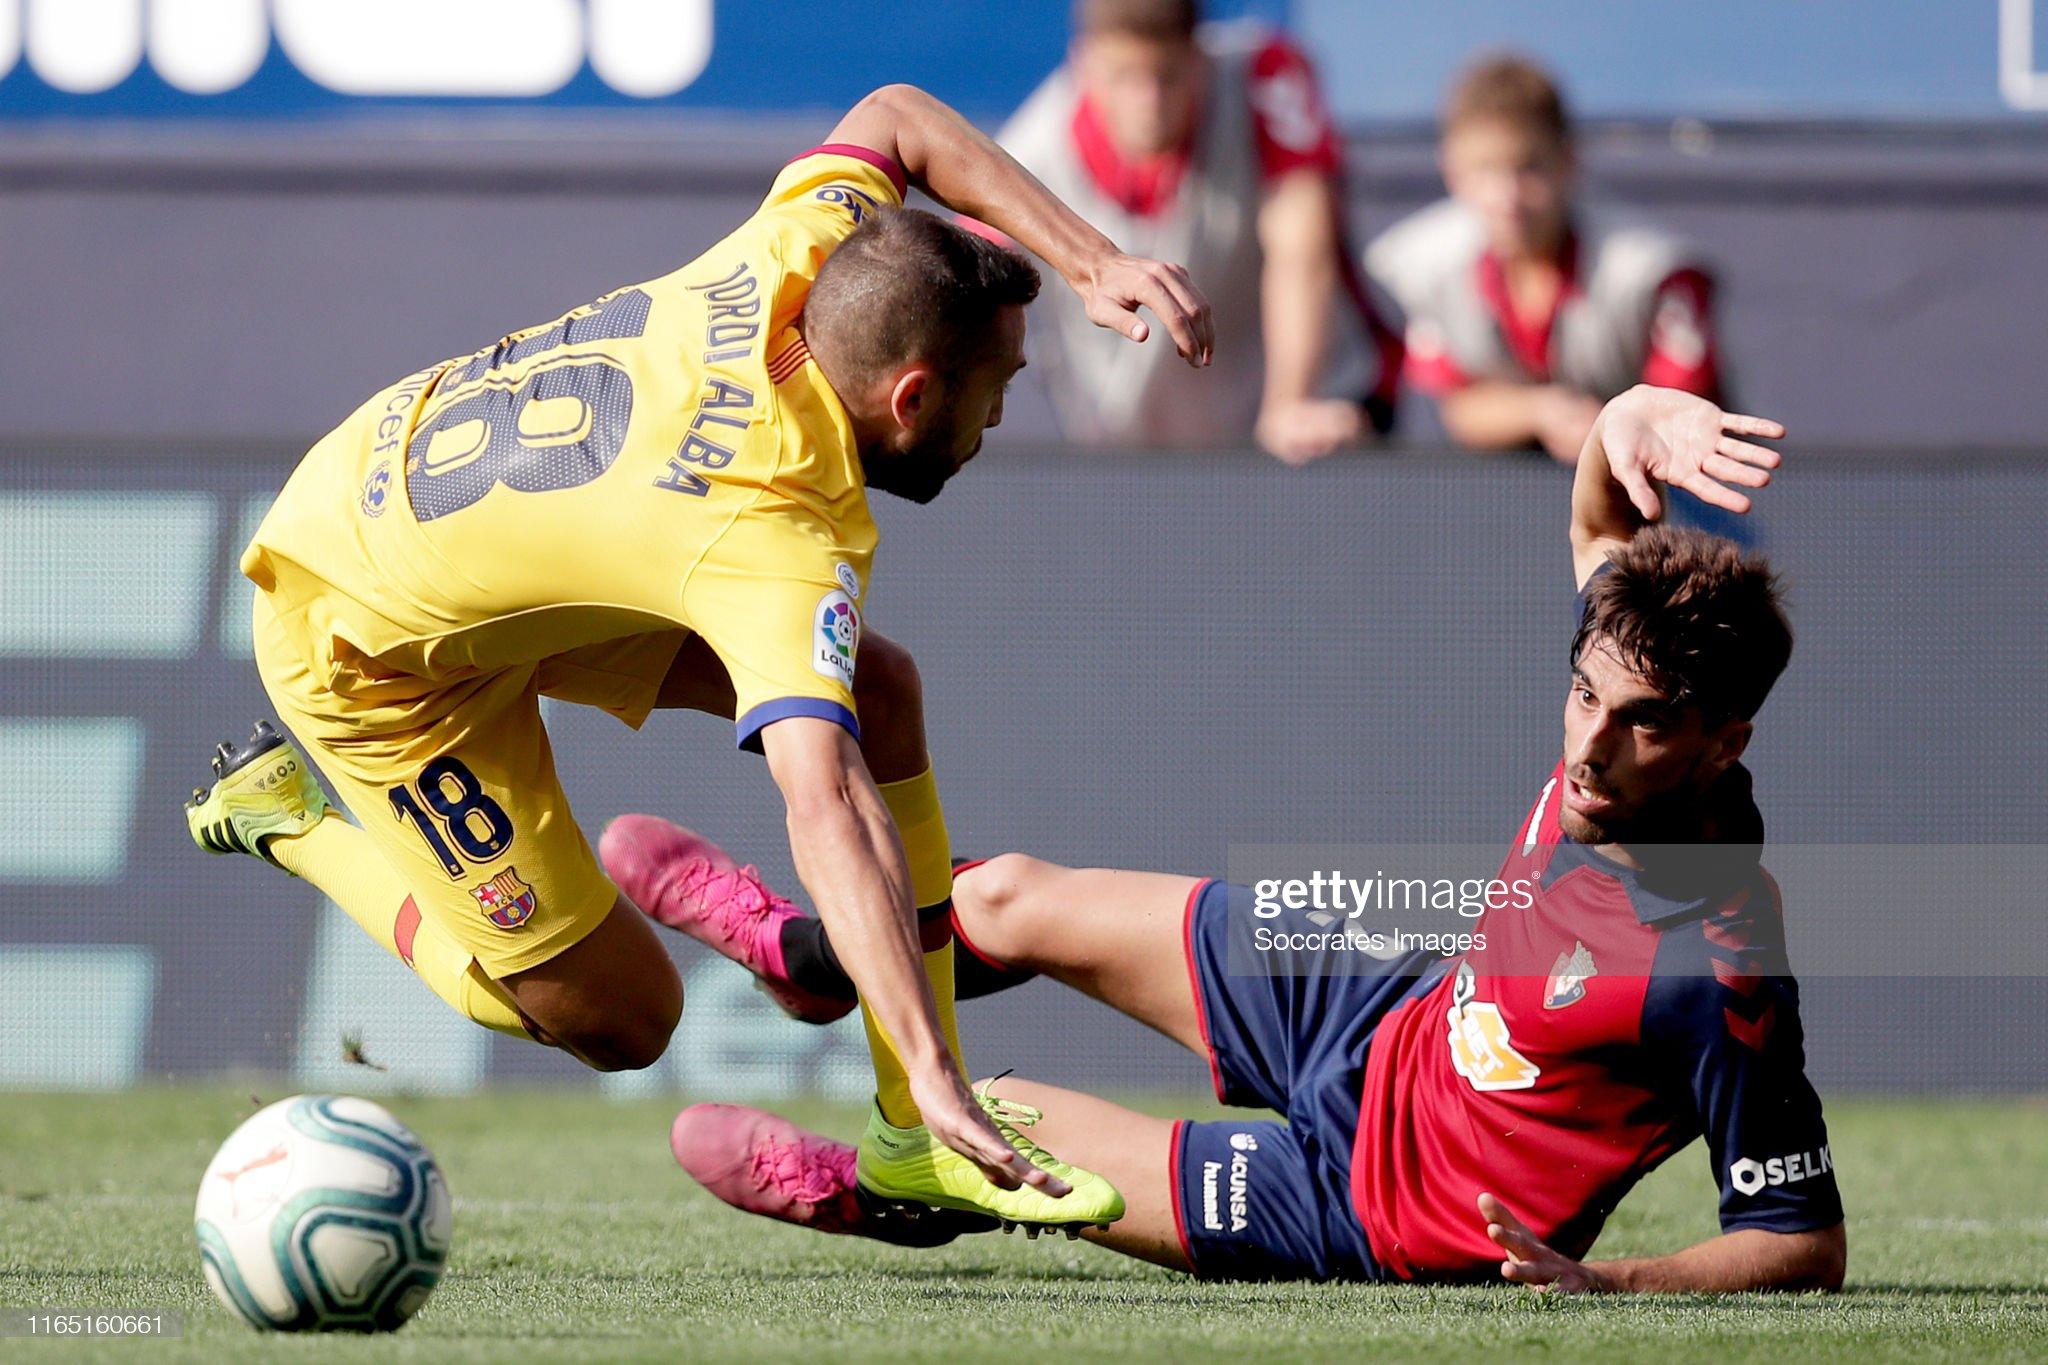 صور مباراة : أوساسونا - برشلونة 2-2 ( 31-08-2019 )  Jordi-alba-of-fc-barcelona-nacho-vidal-of-ca-osasuna-during-the-la-picture-id1165160661?s=2048x2048